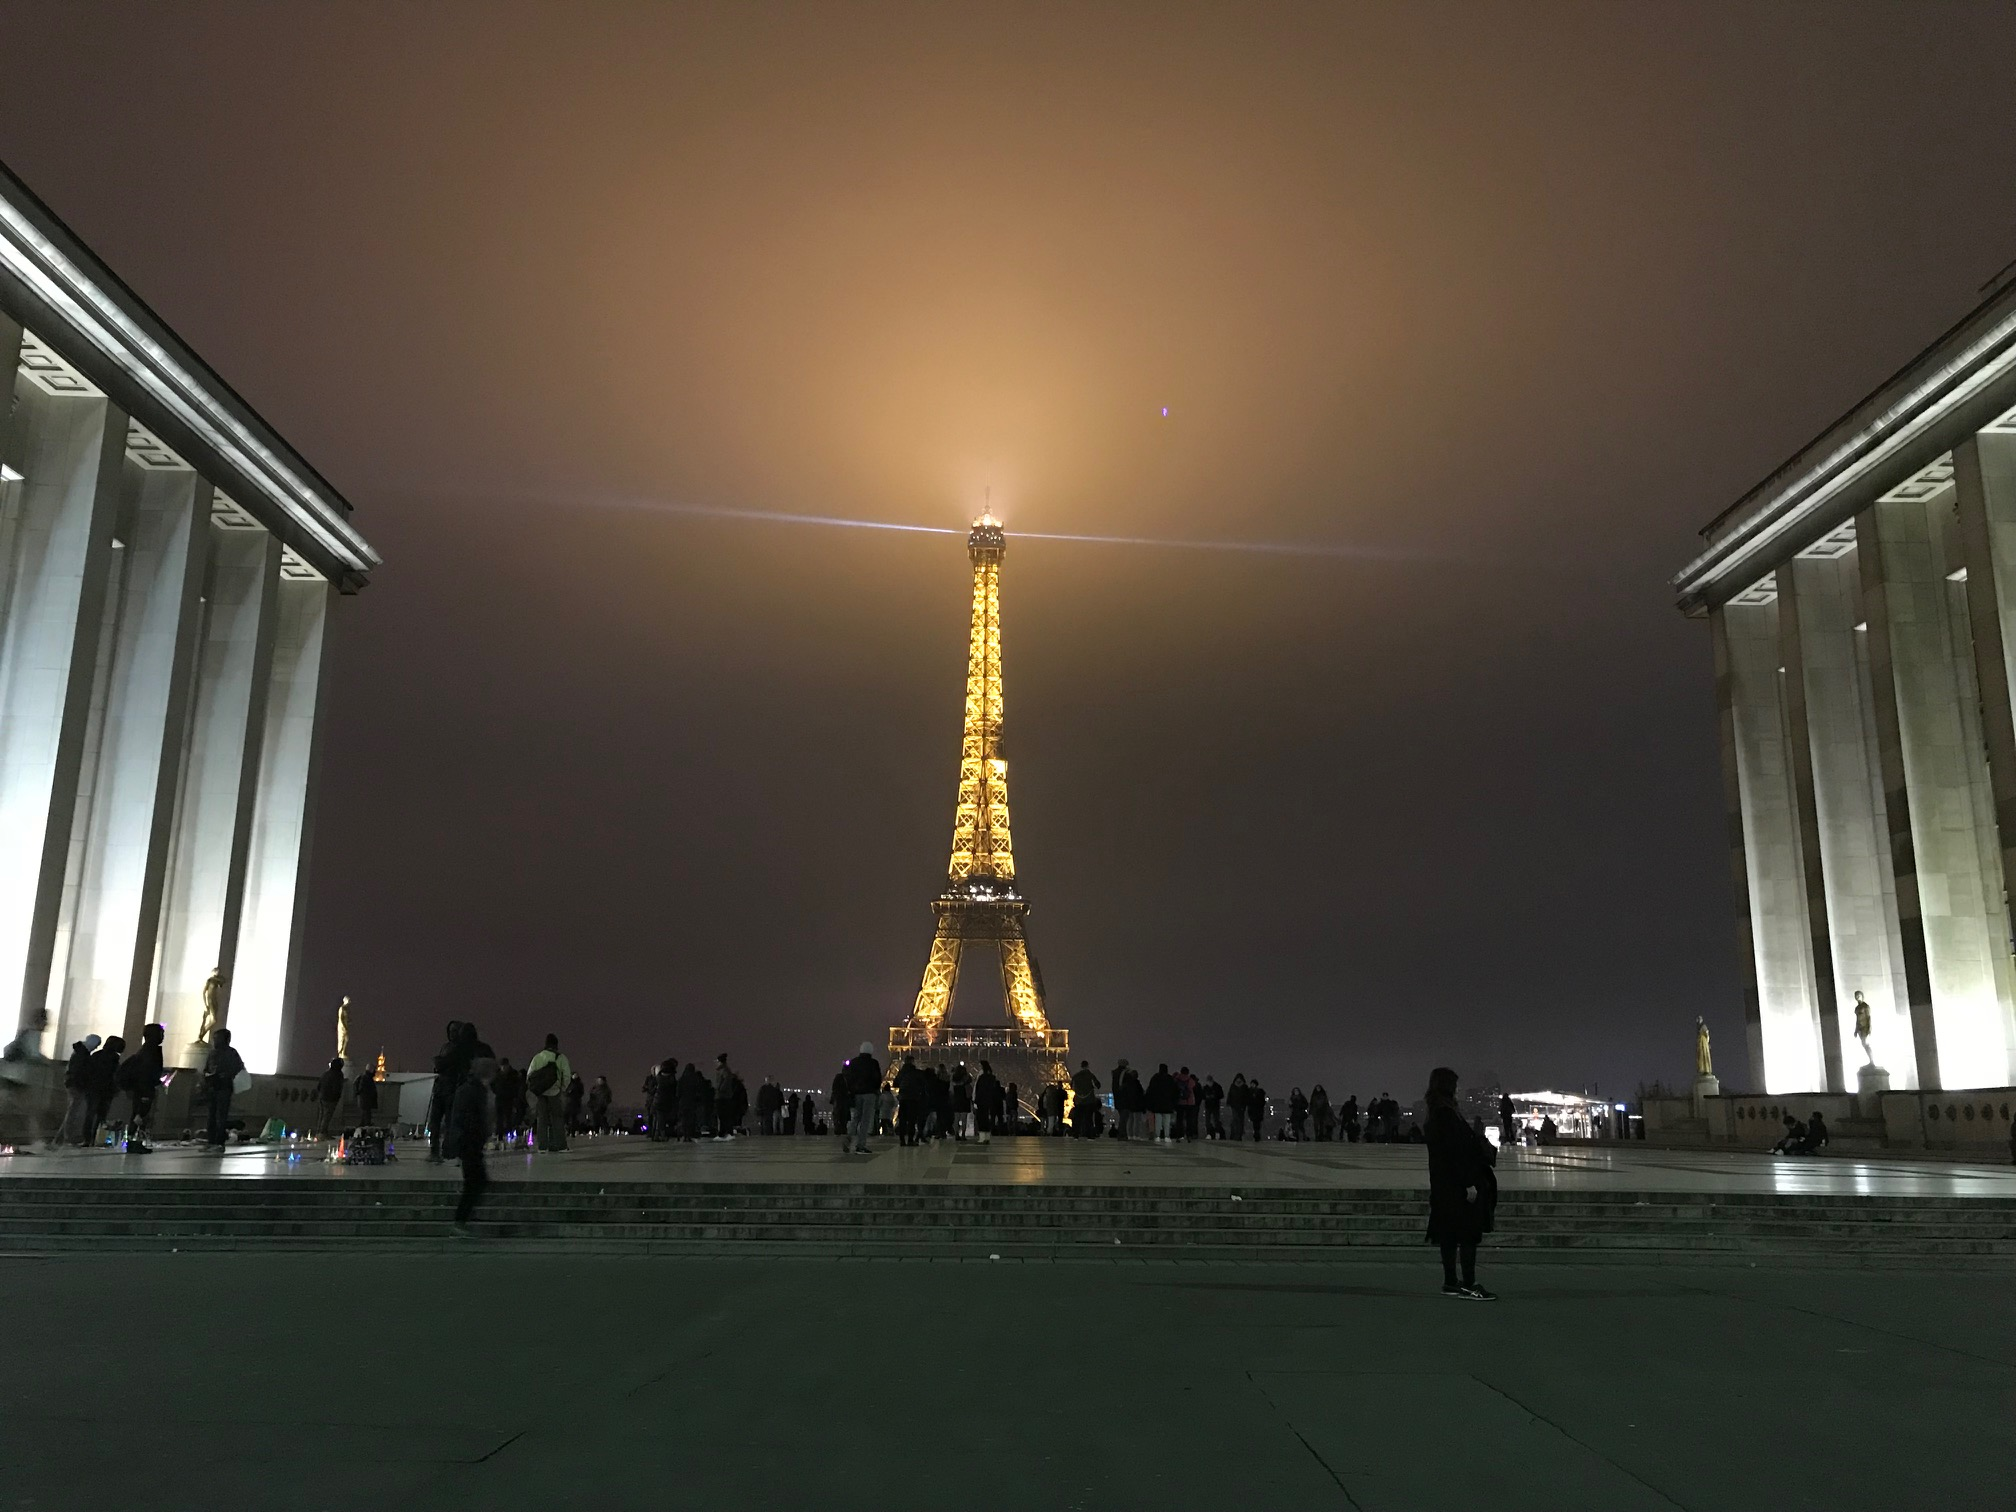 Eiffel Tower - KT17